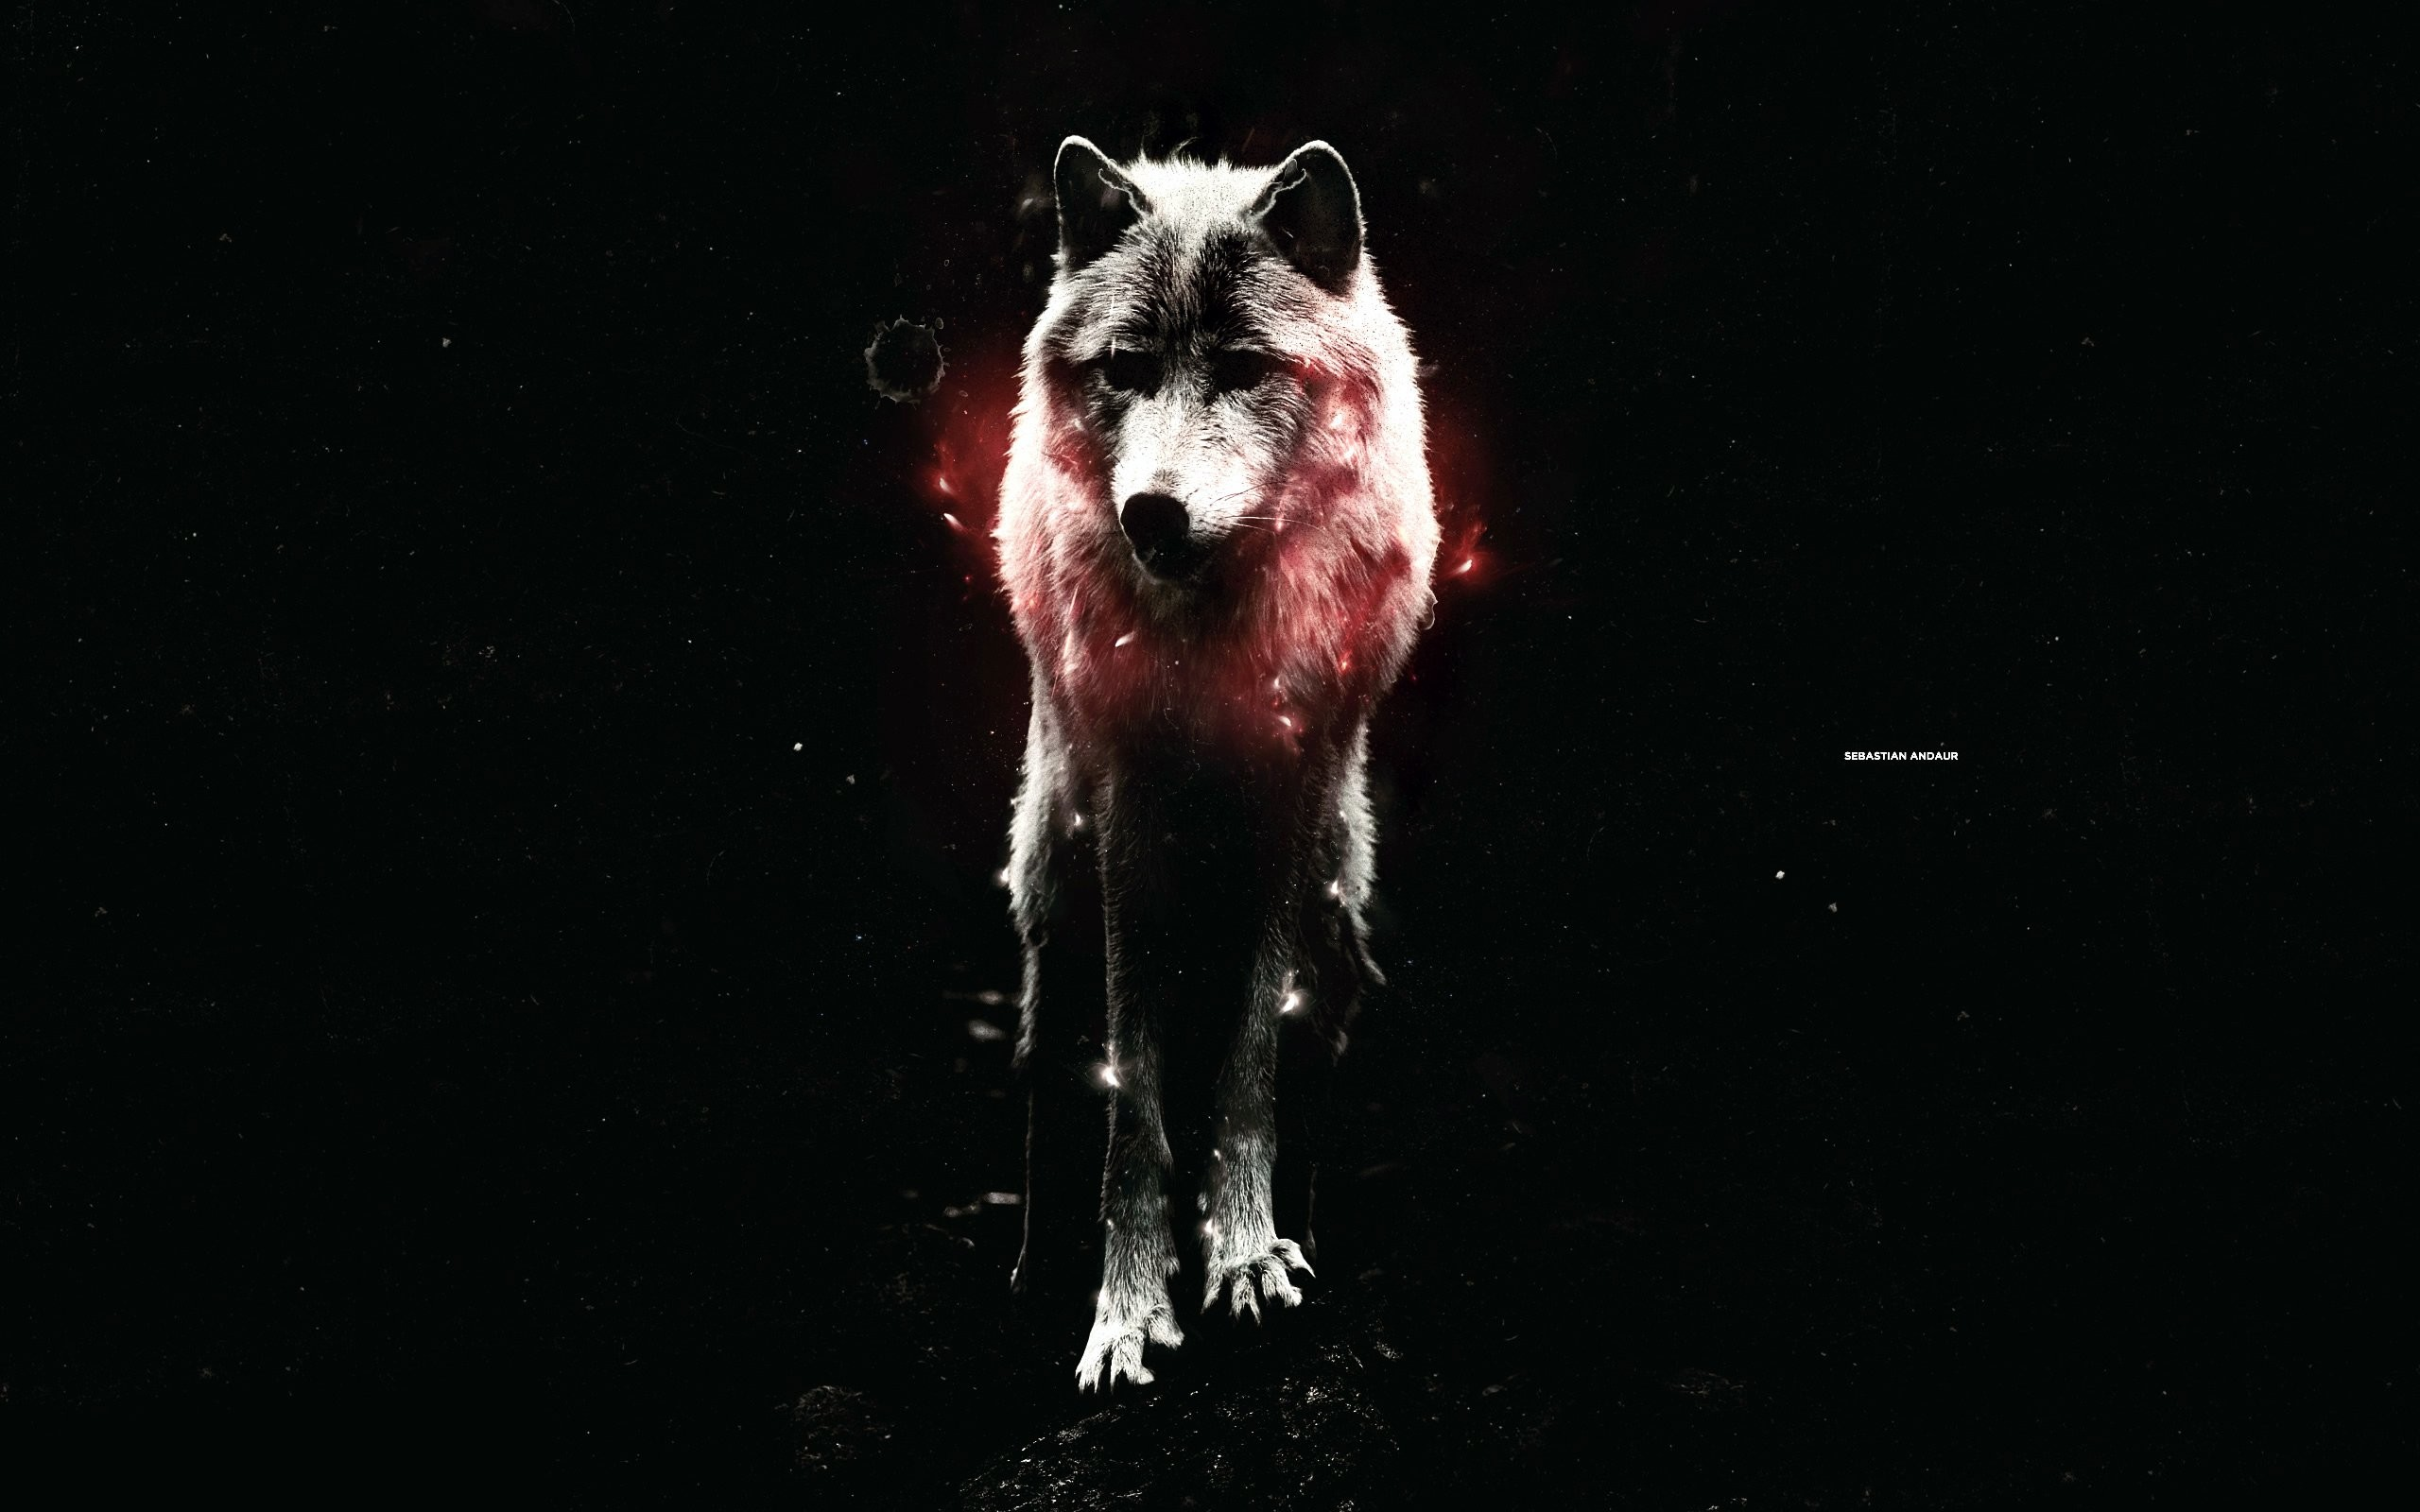 Wolf wallpaper with dark / black background / space